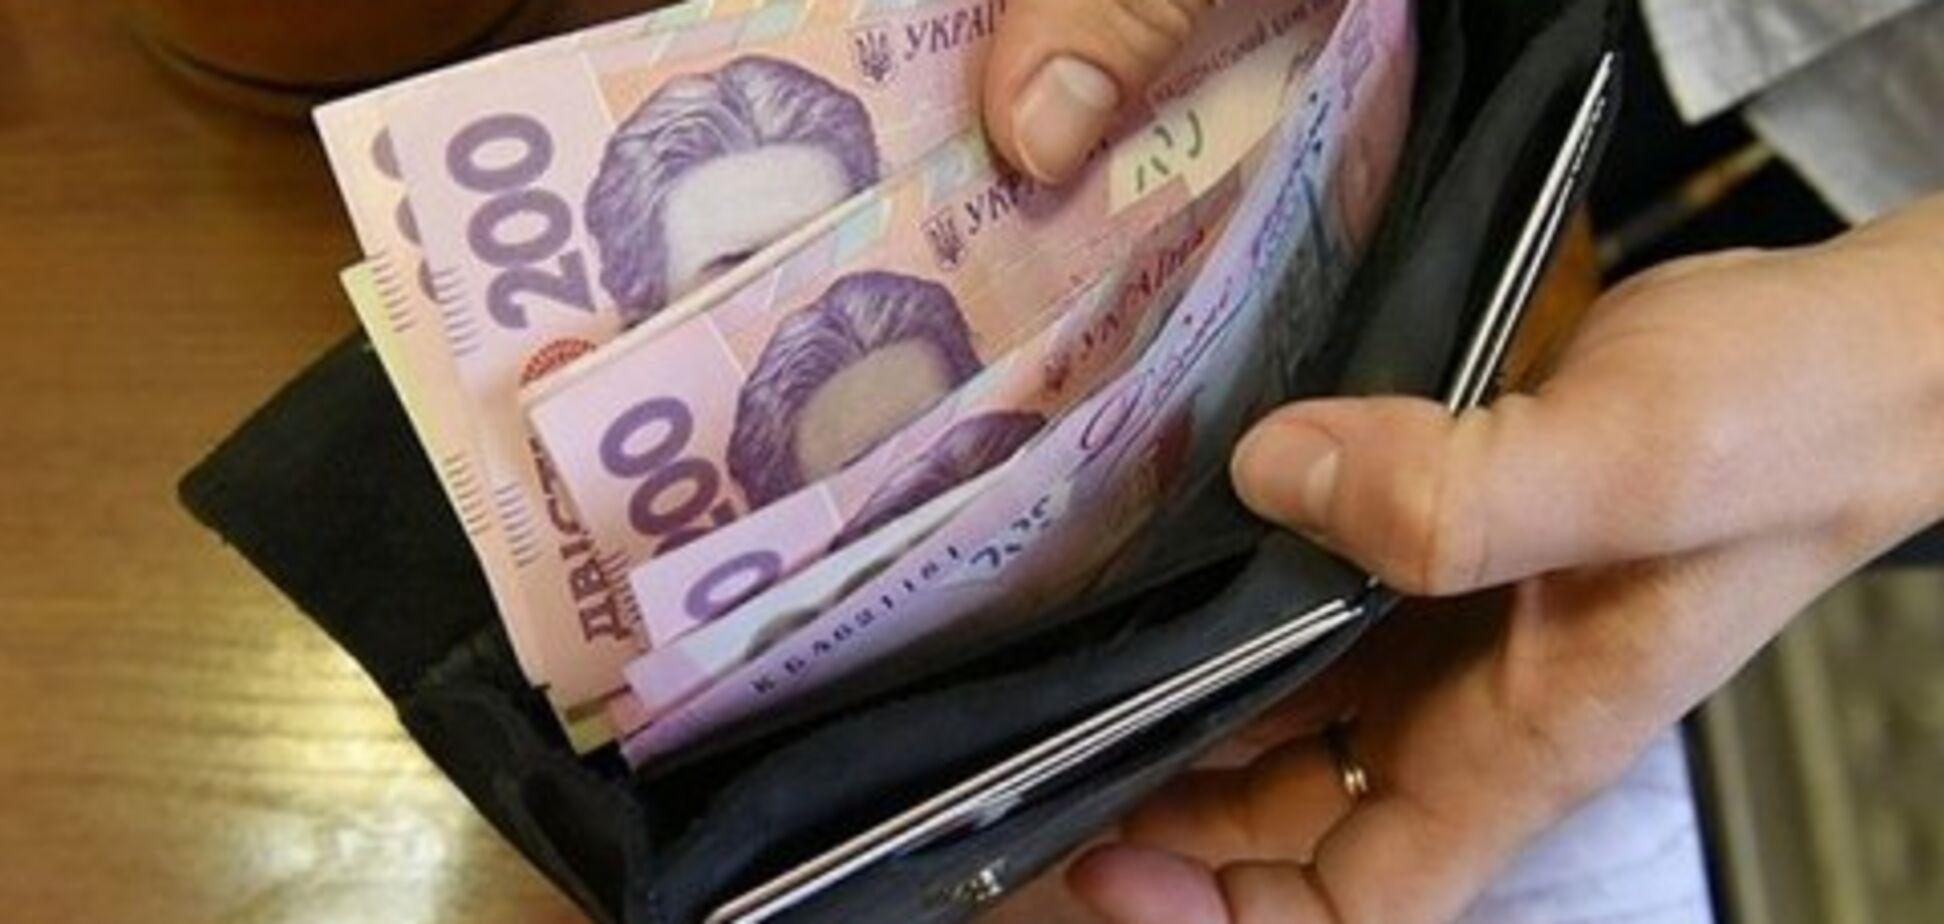 Средняя зарплата в Украине пробила новую отметку: озвучена сумма